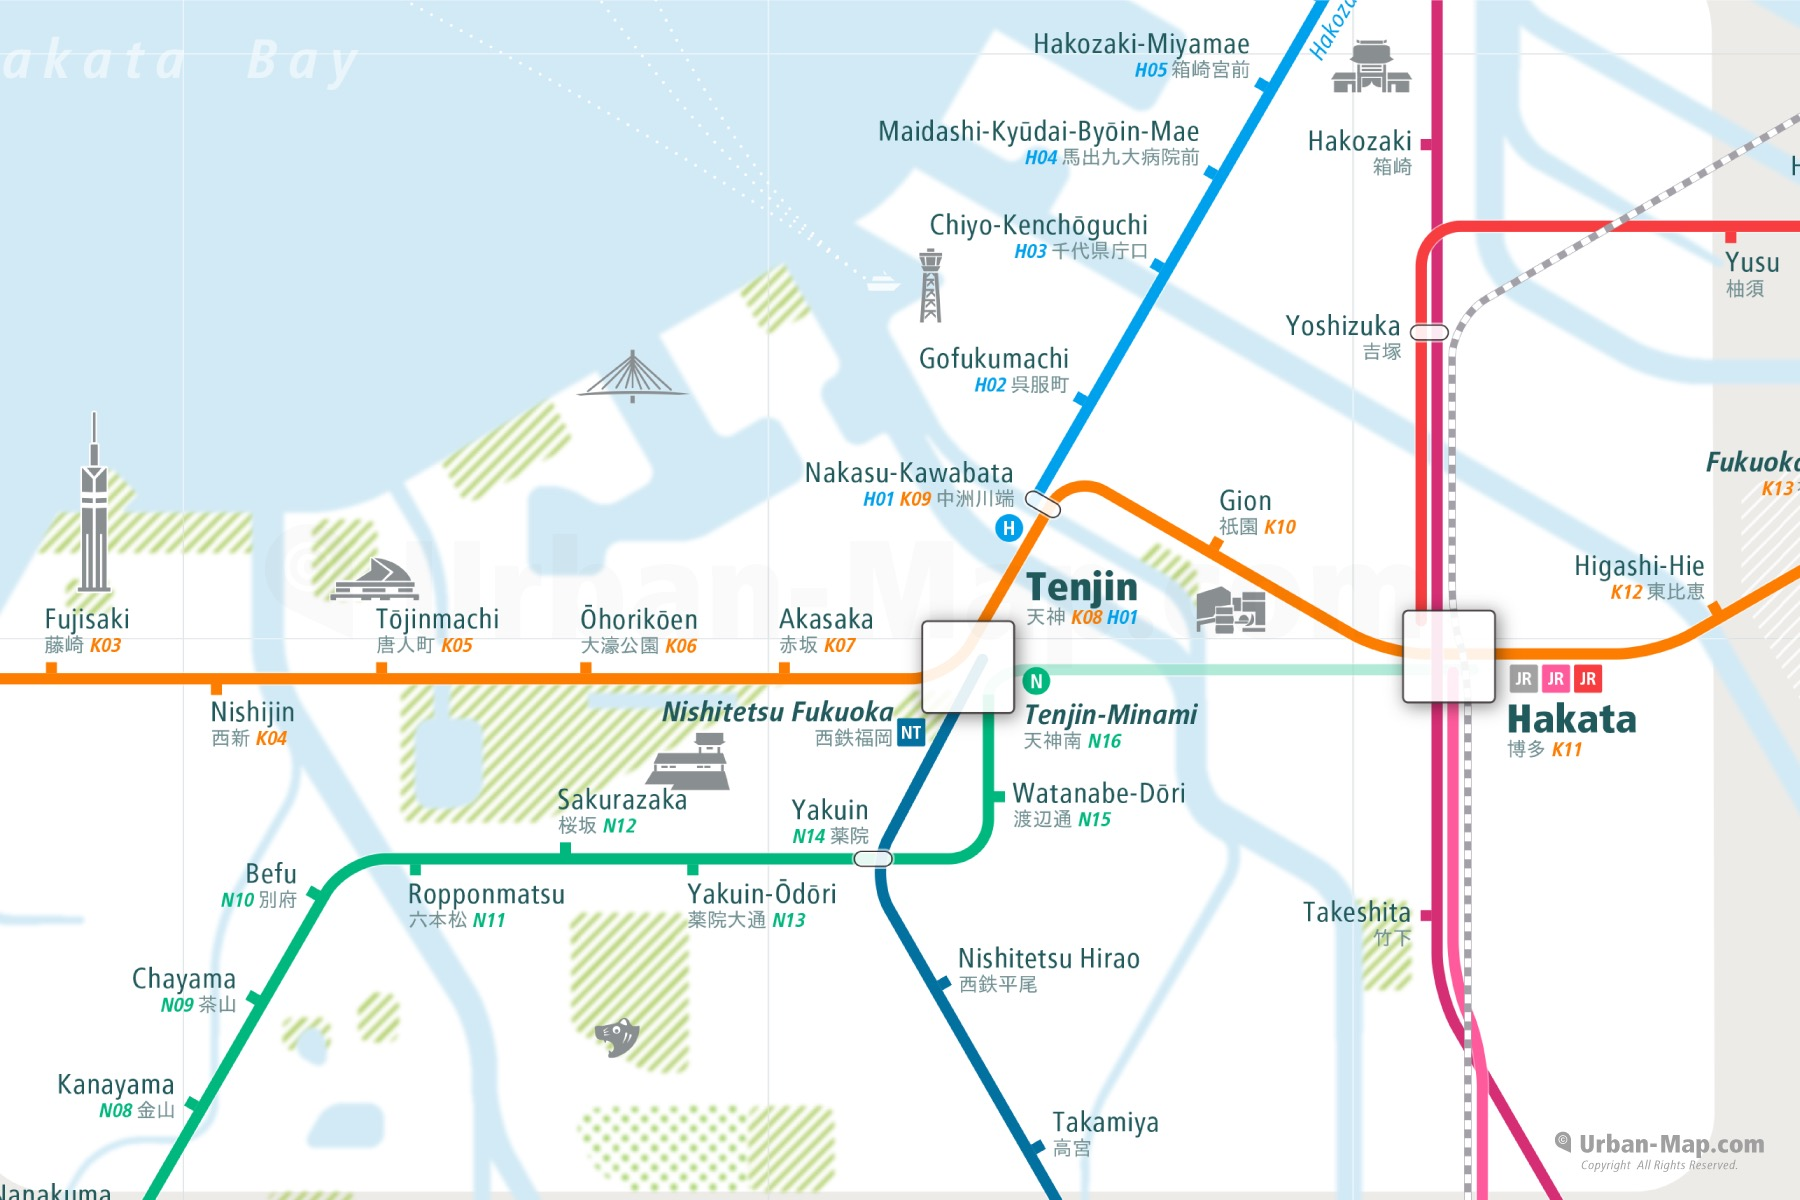 Fukuoka City Rail Map shows the train and public transportation routes of metro - Close-Up